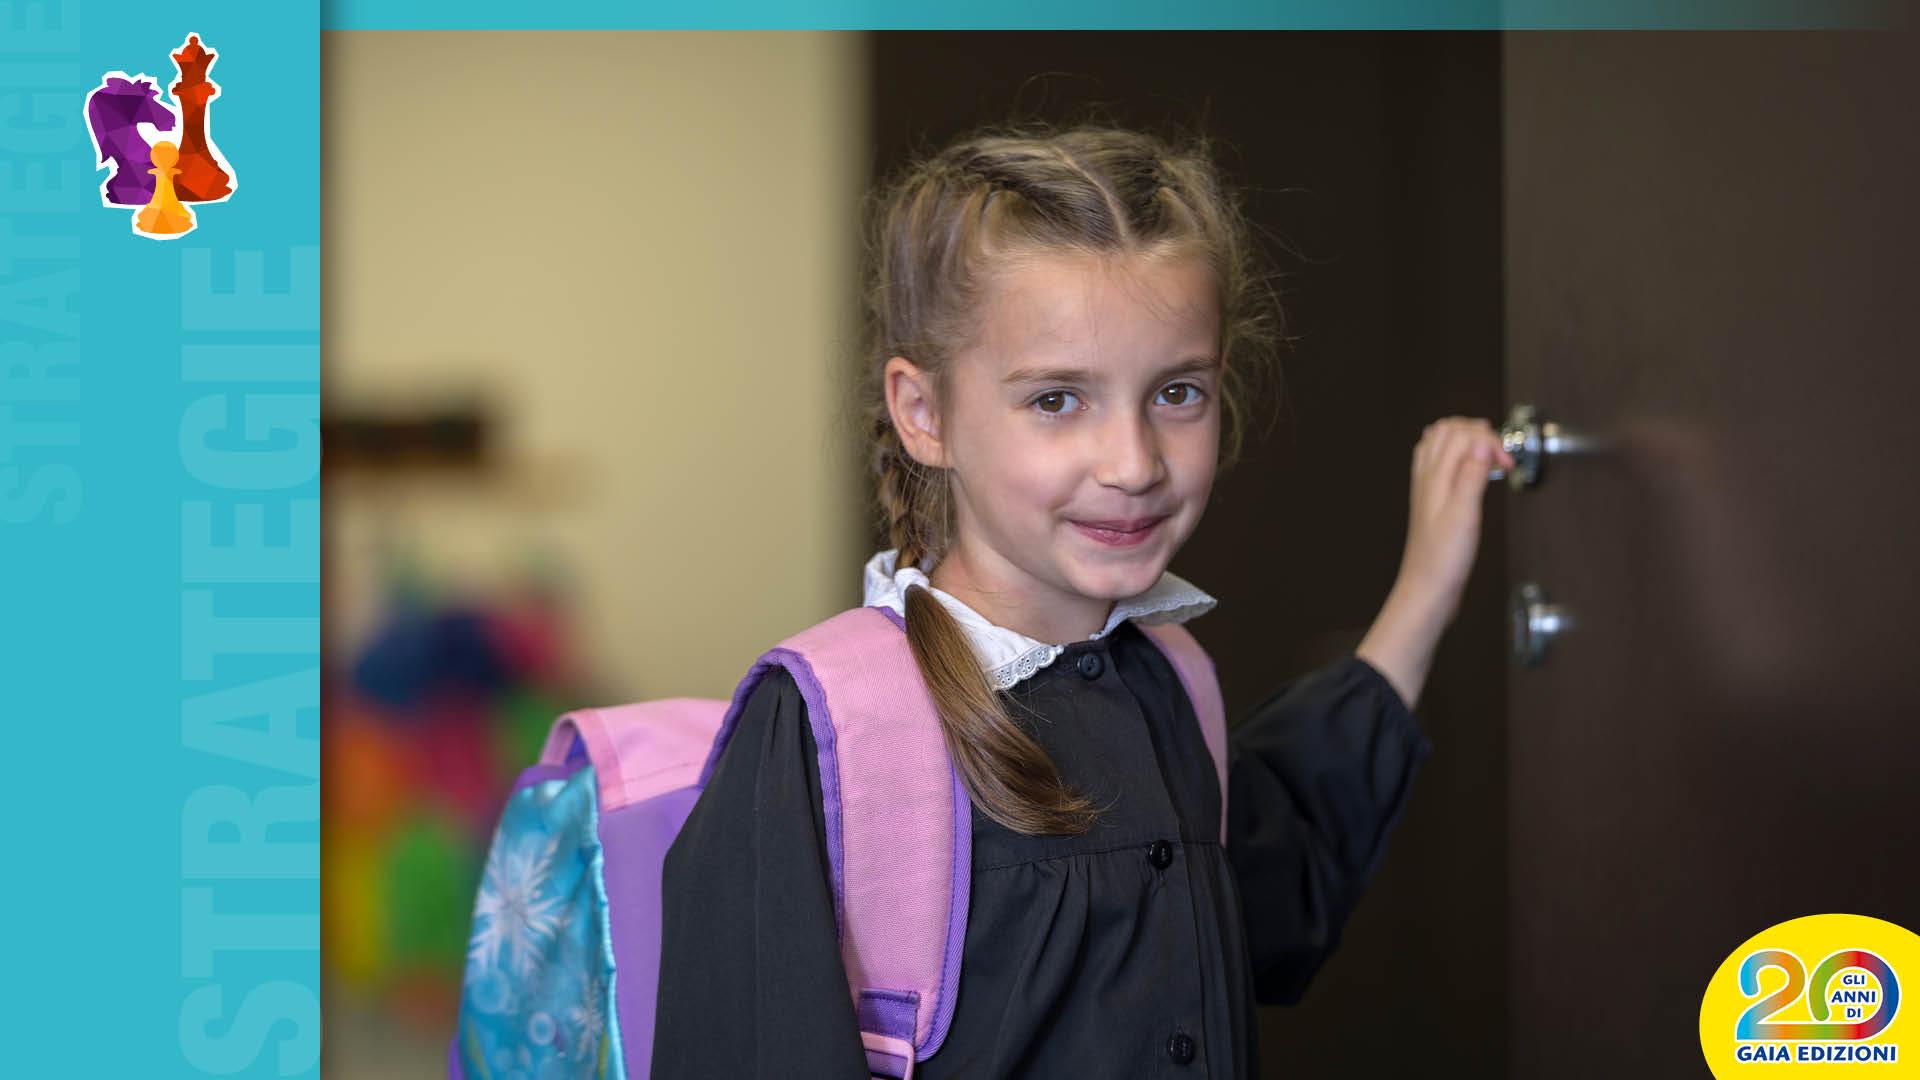 Bambina a scuola chiude la porta